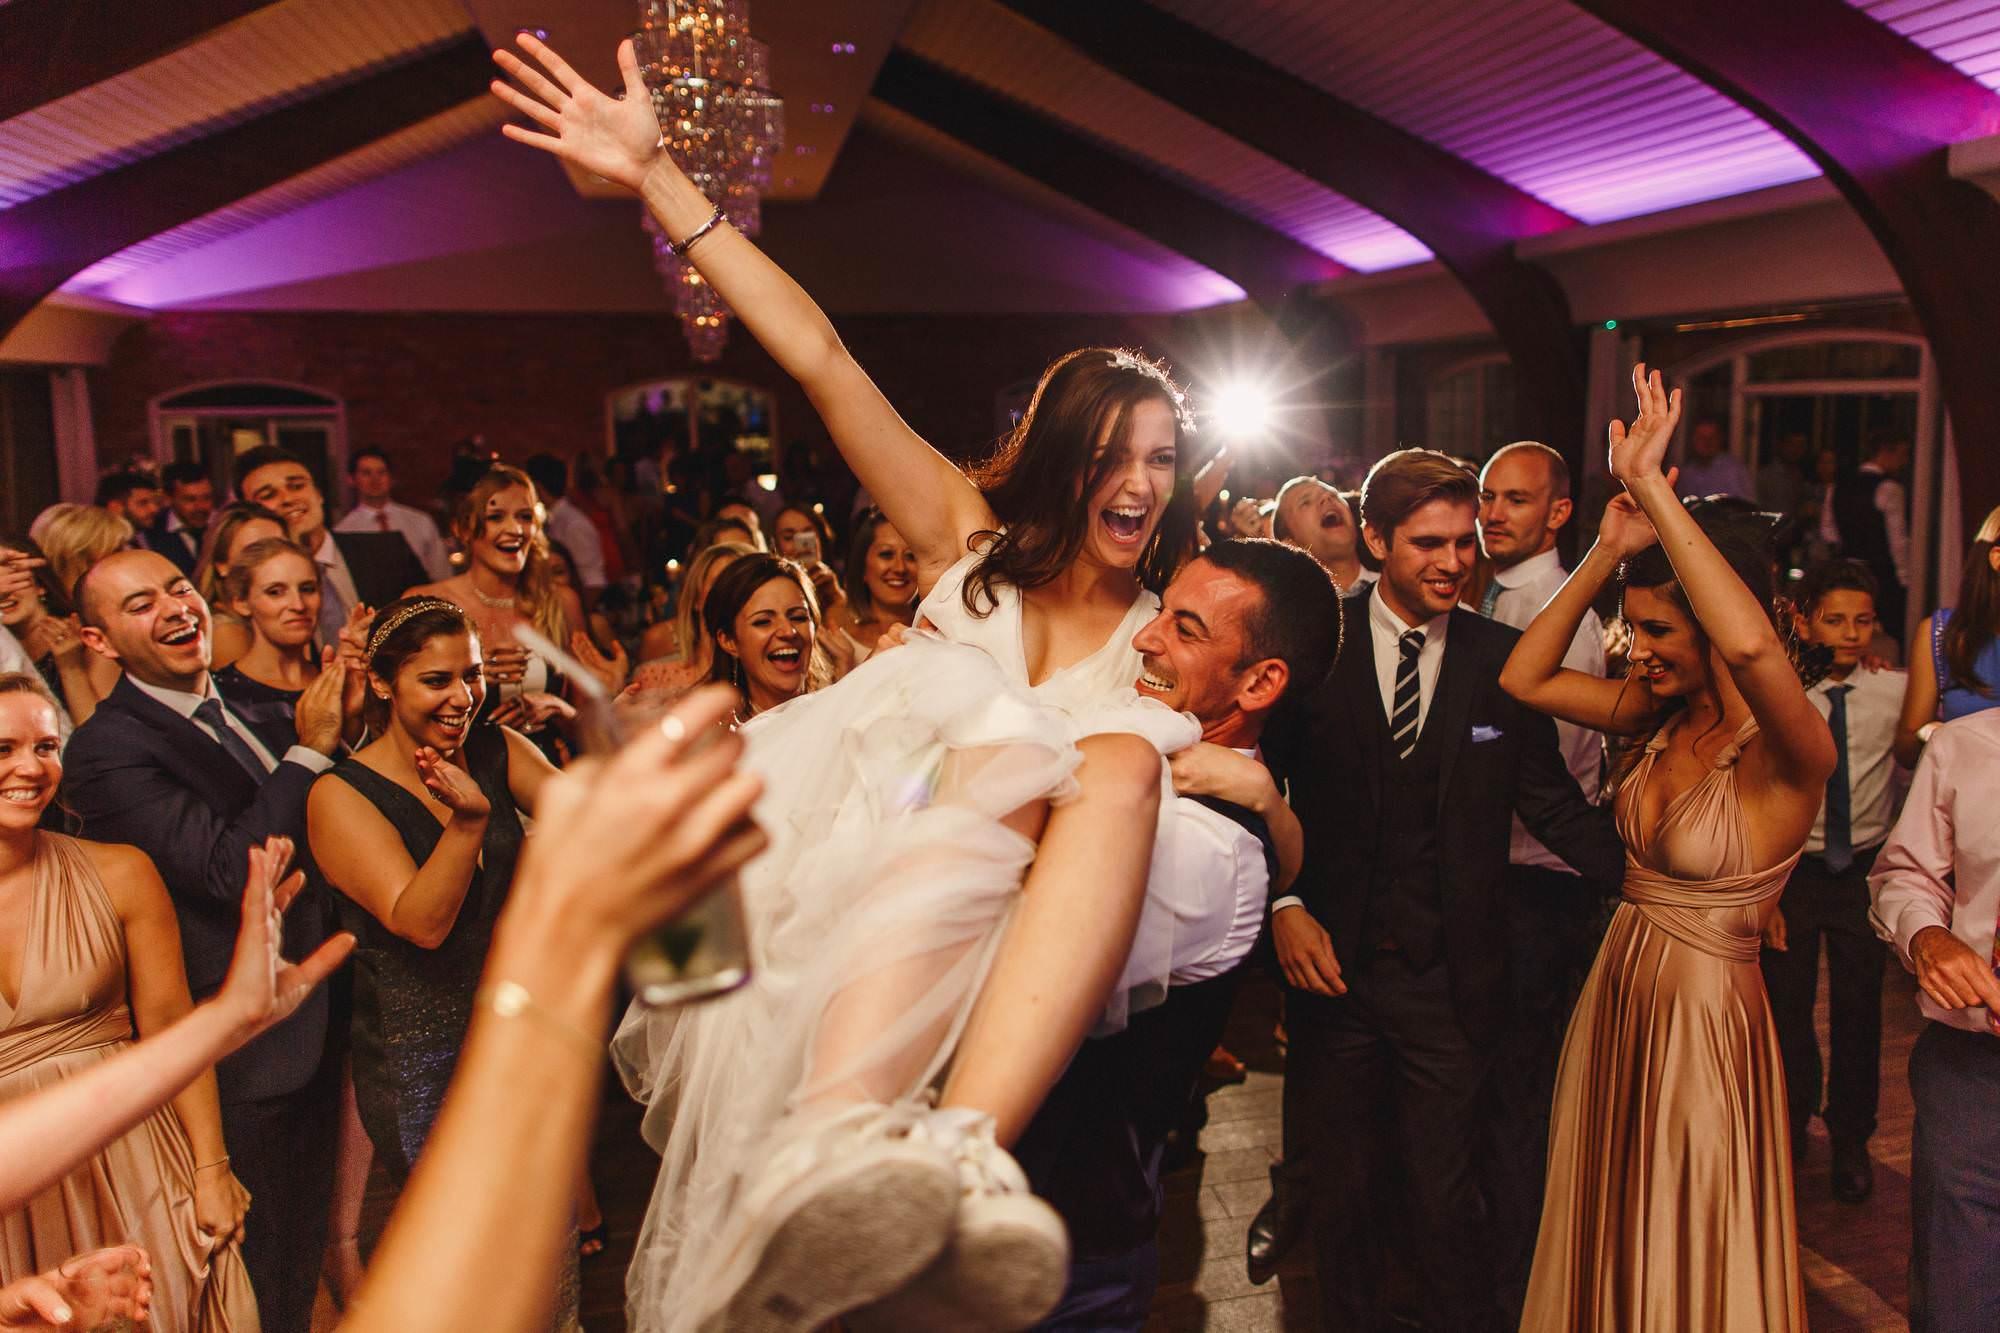 Cheshire wedding photography - Colshaw hall